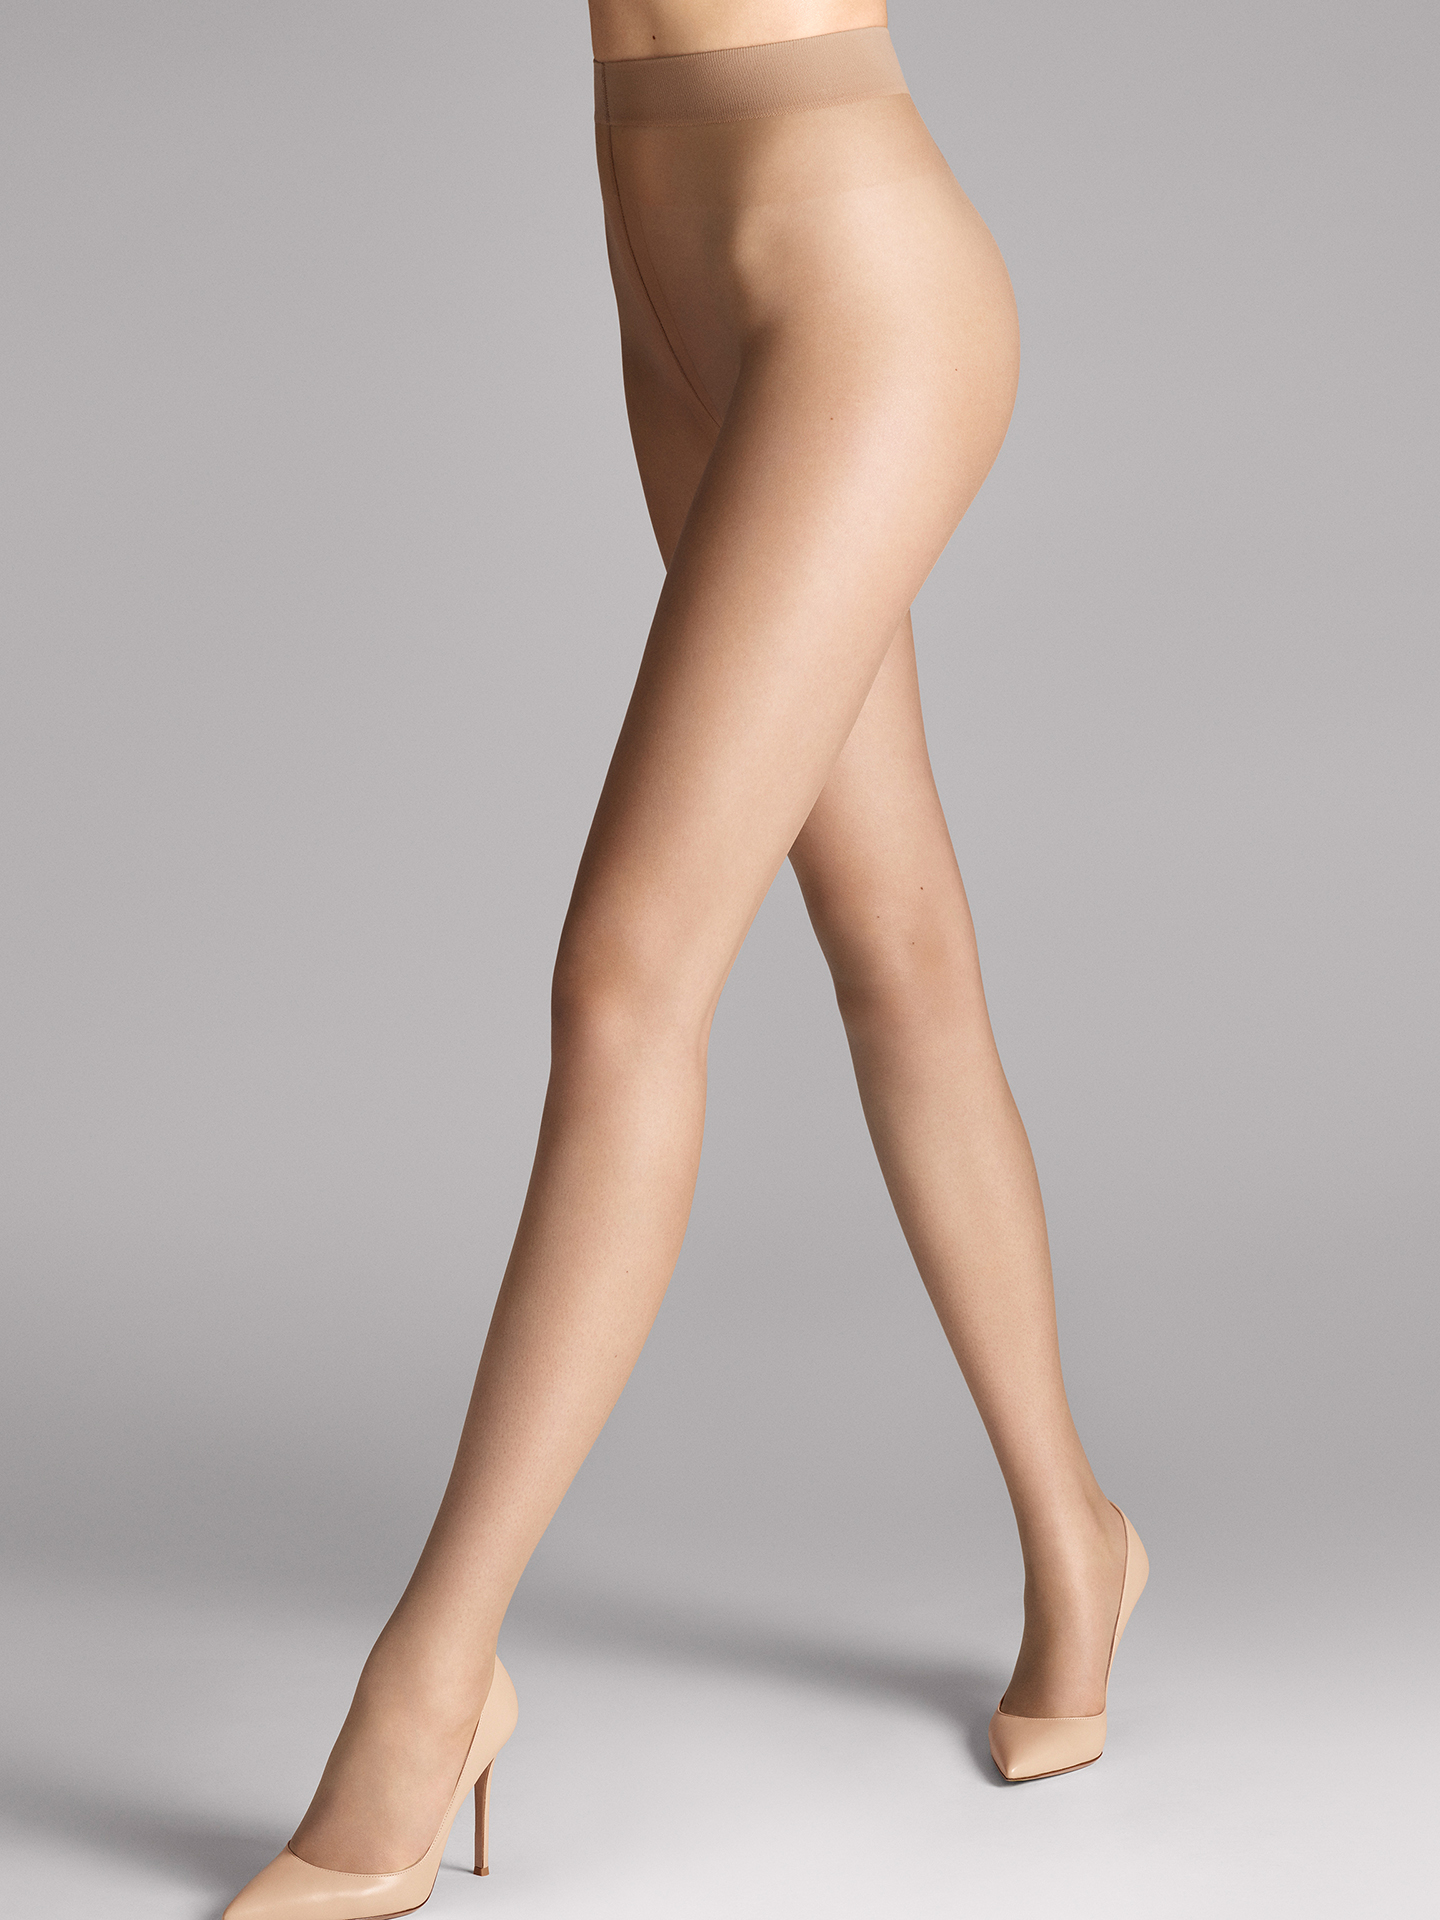 Nude 8 Tights - 4273 - XS